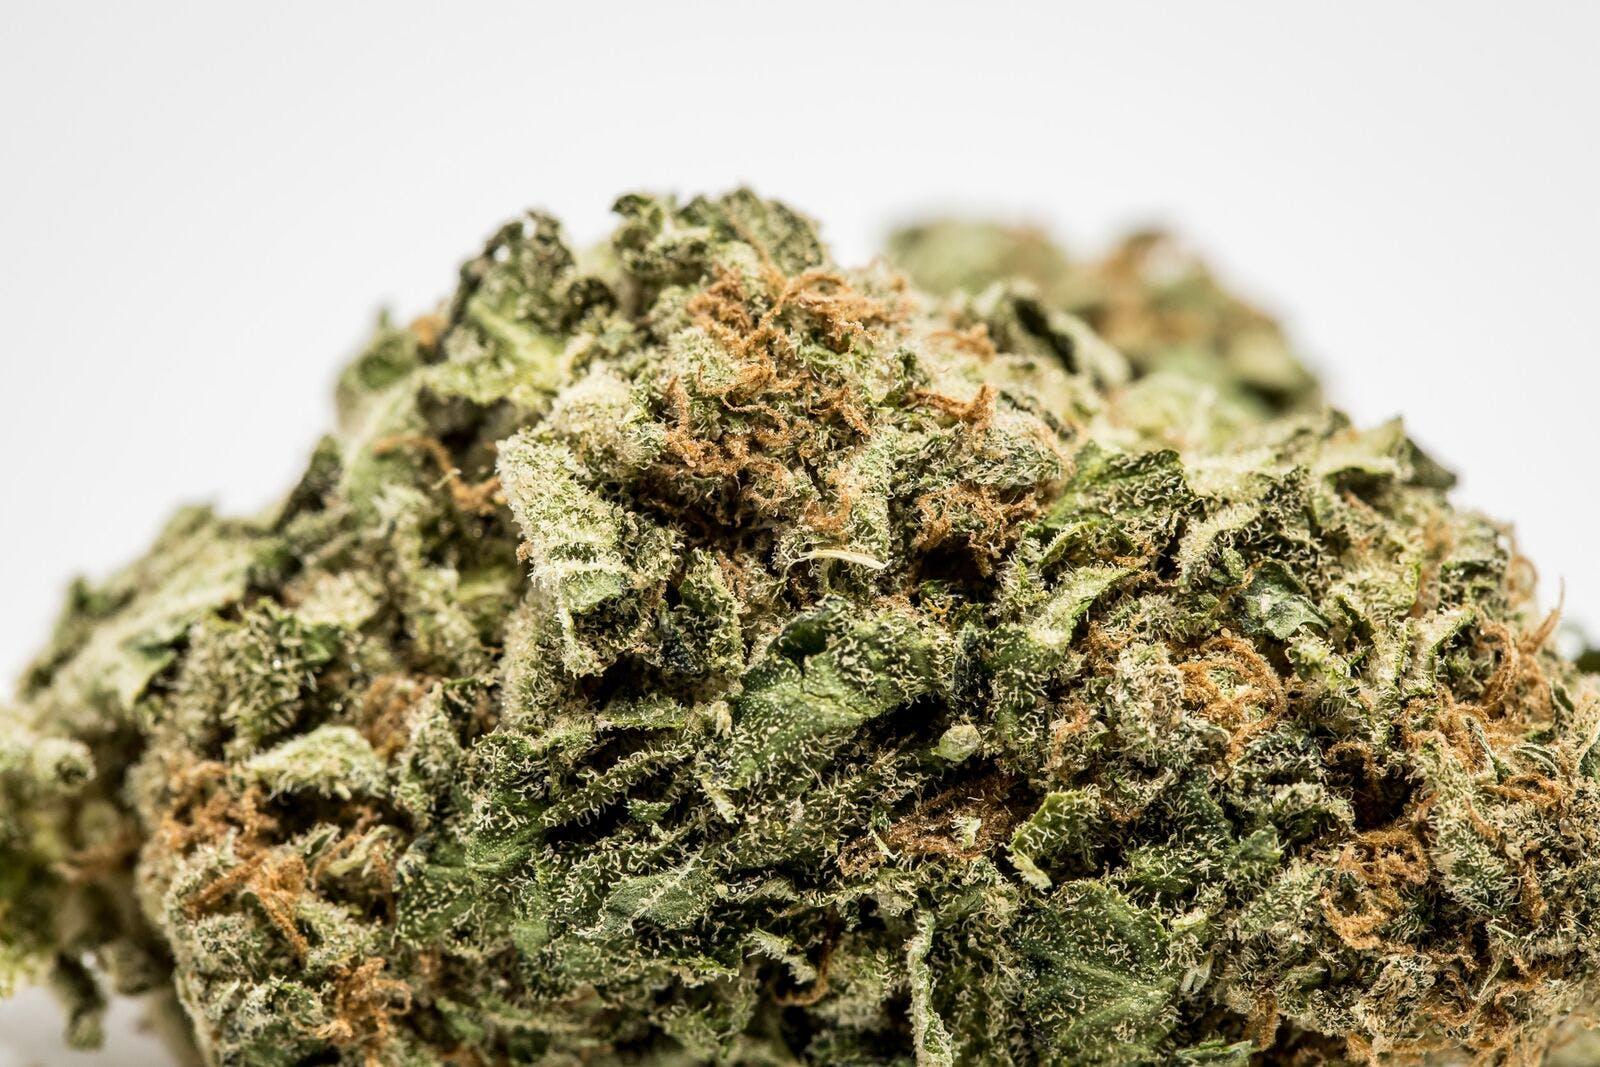 AMS Weed; AMS Cannabis Strain; AMS Indica Marijuana Strain